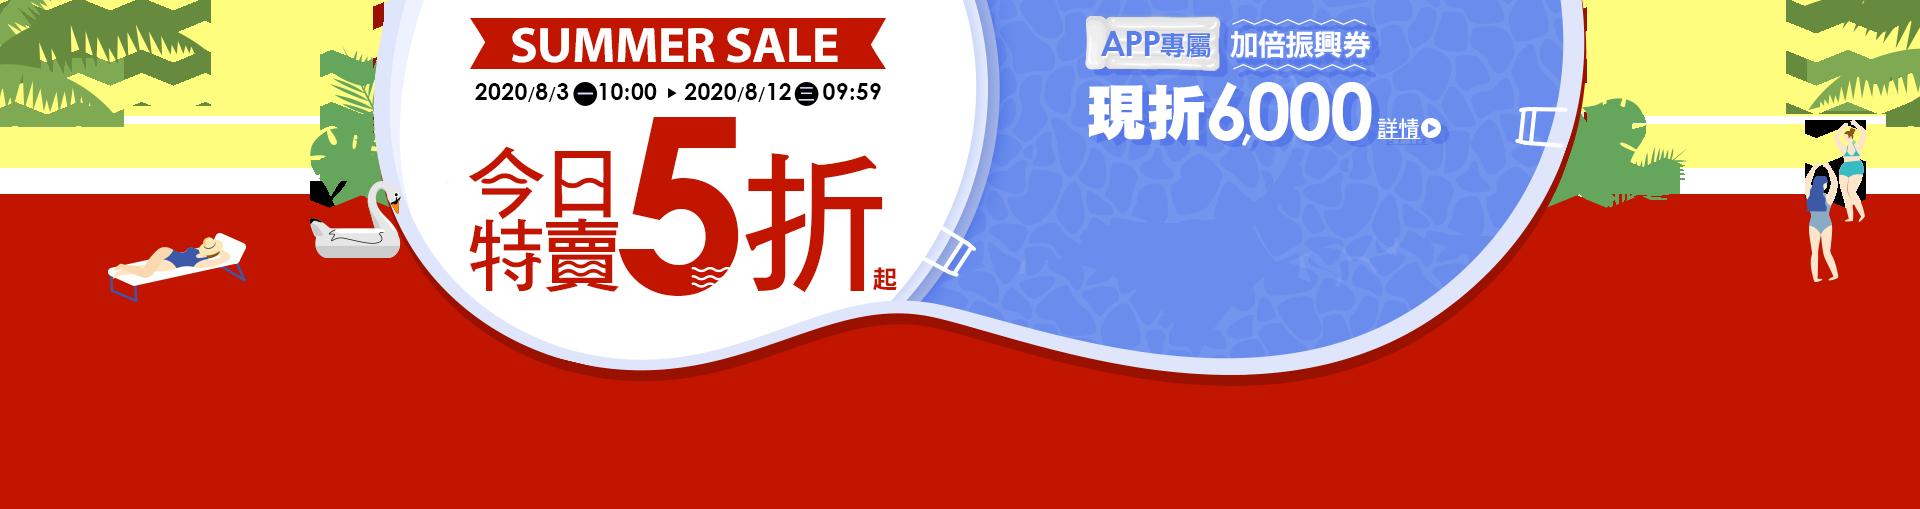 Summer sale全站5折起!好評加碼!結帳不限金額再9折| Rakuten樂天市場